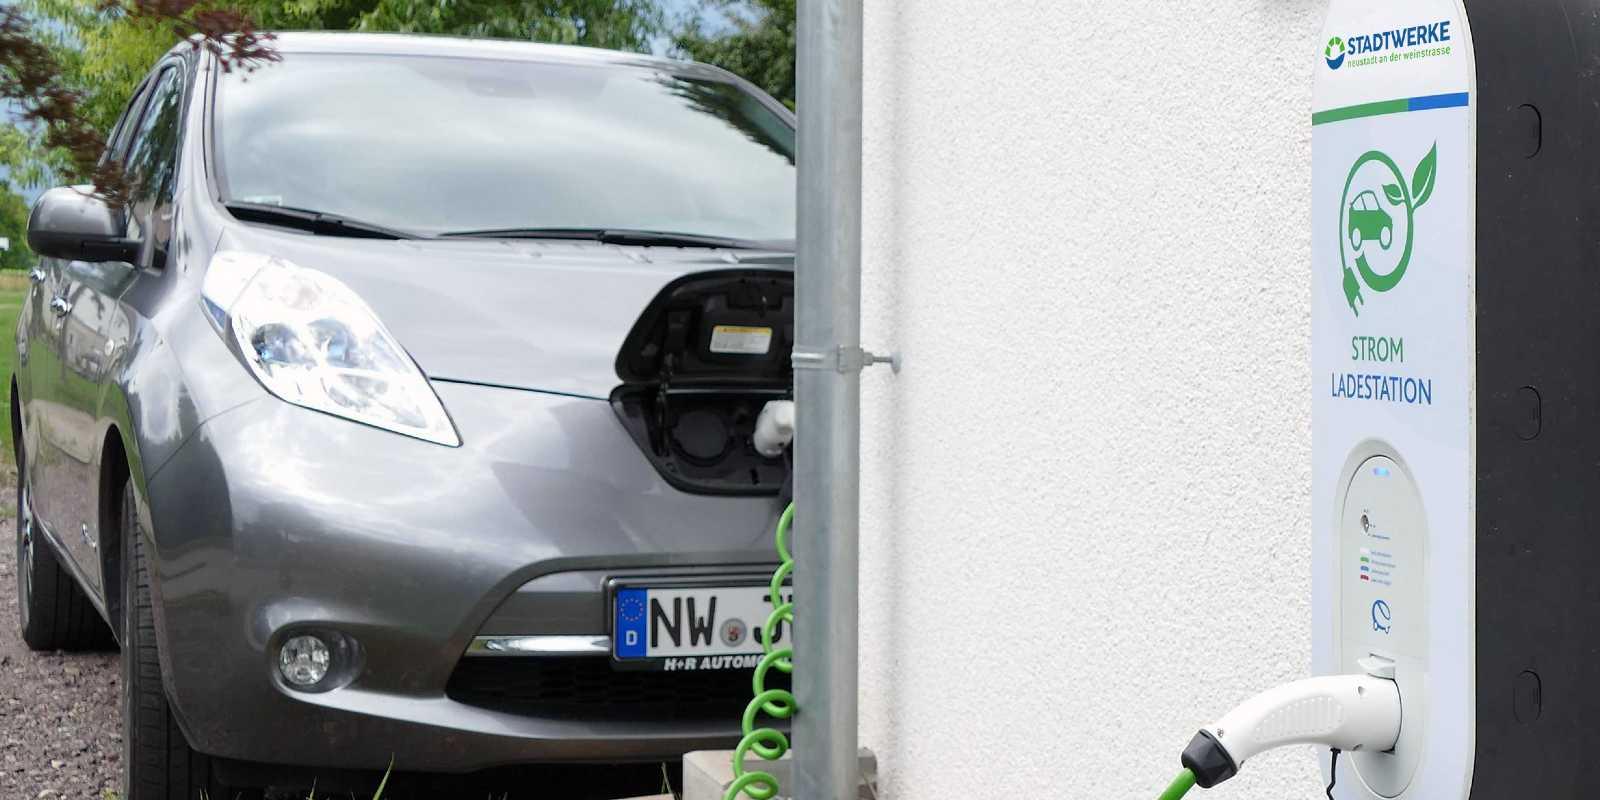 Stadtwerke Neustadt Service Kachel Elektromobilität Wallbox